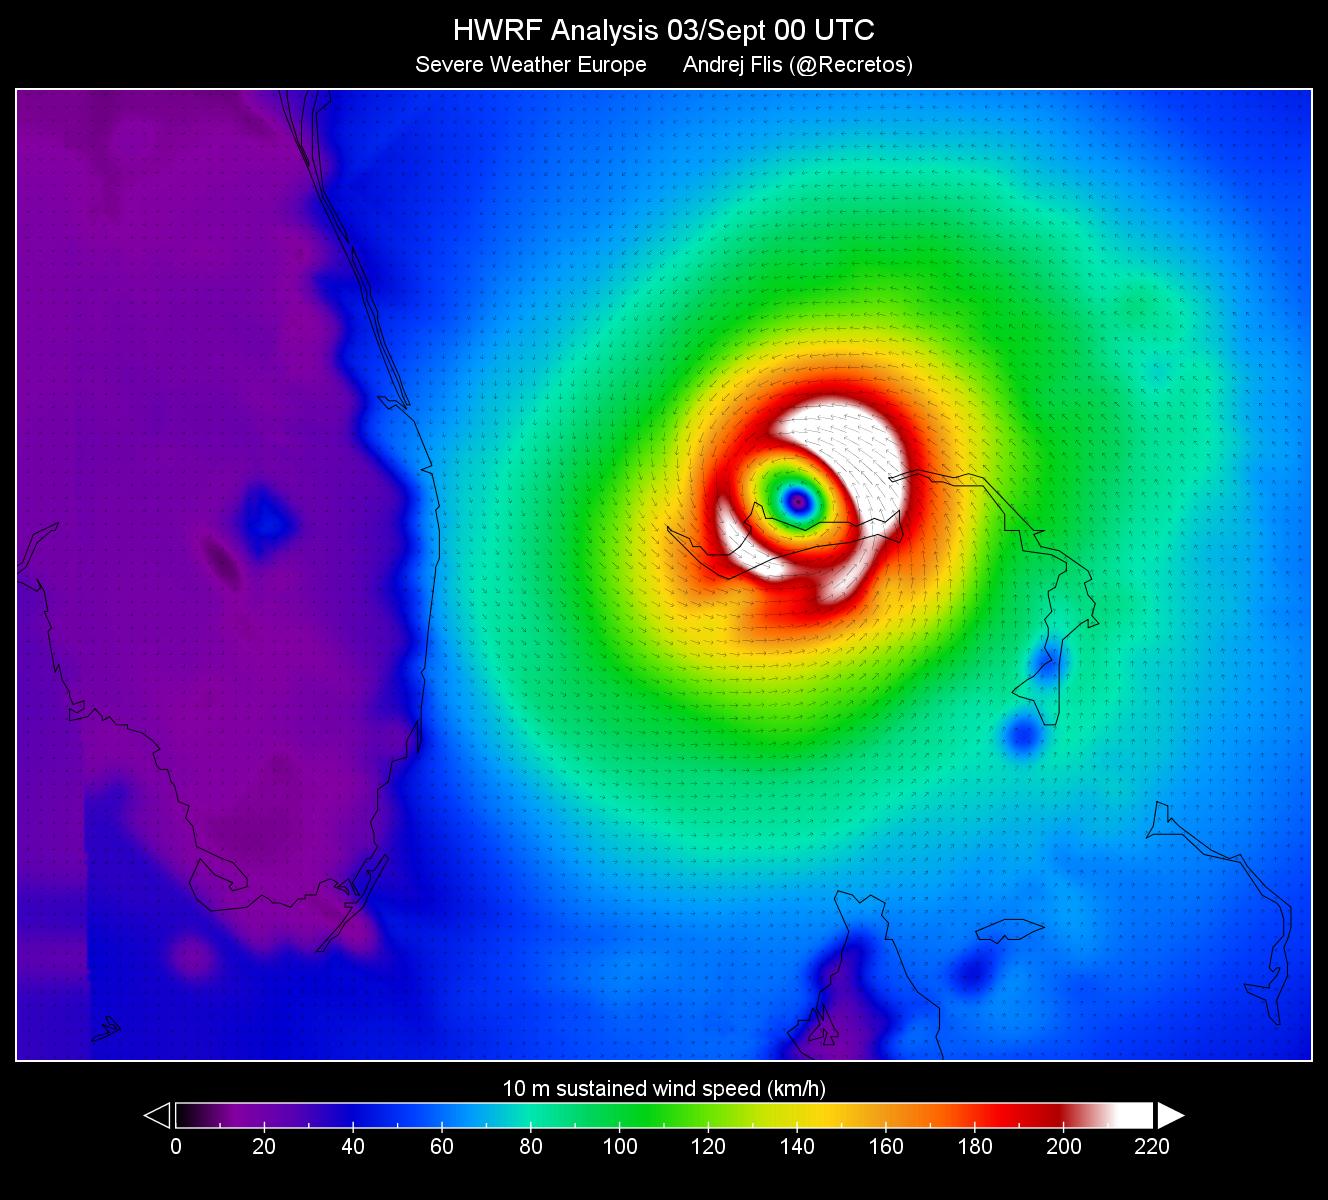 UPDATE: Hurricane Dorian remains stationary, still pounding